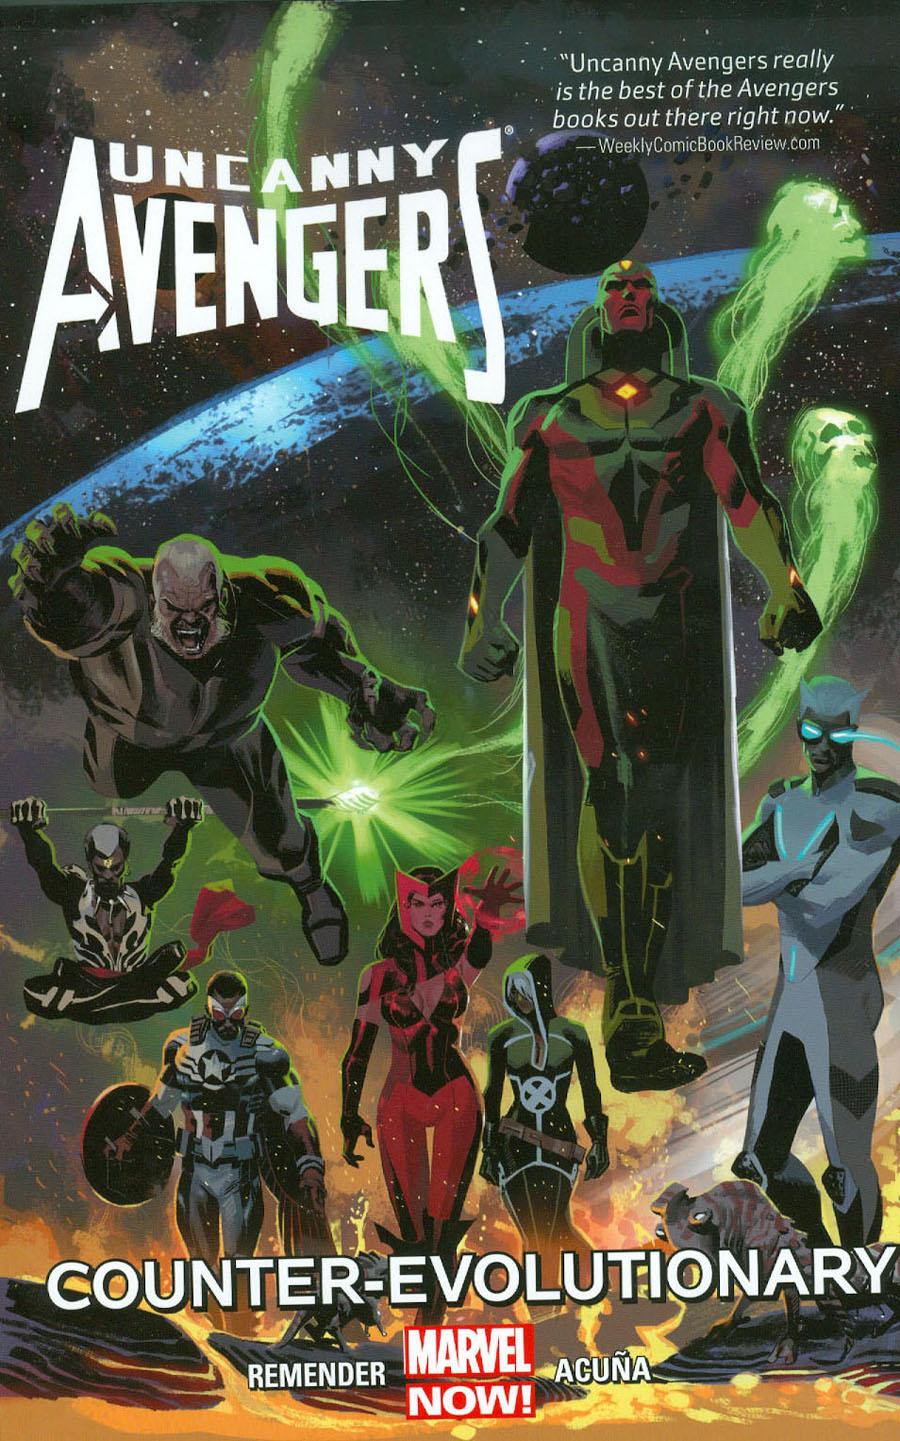 Uncanny Avengers Vol 1 Counter-Evolutionary TP